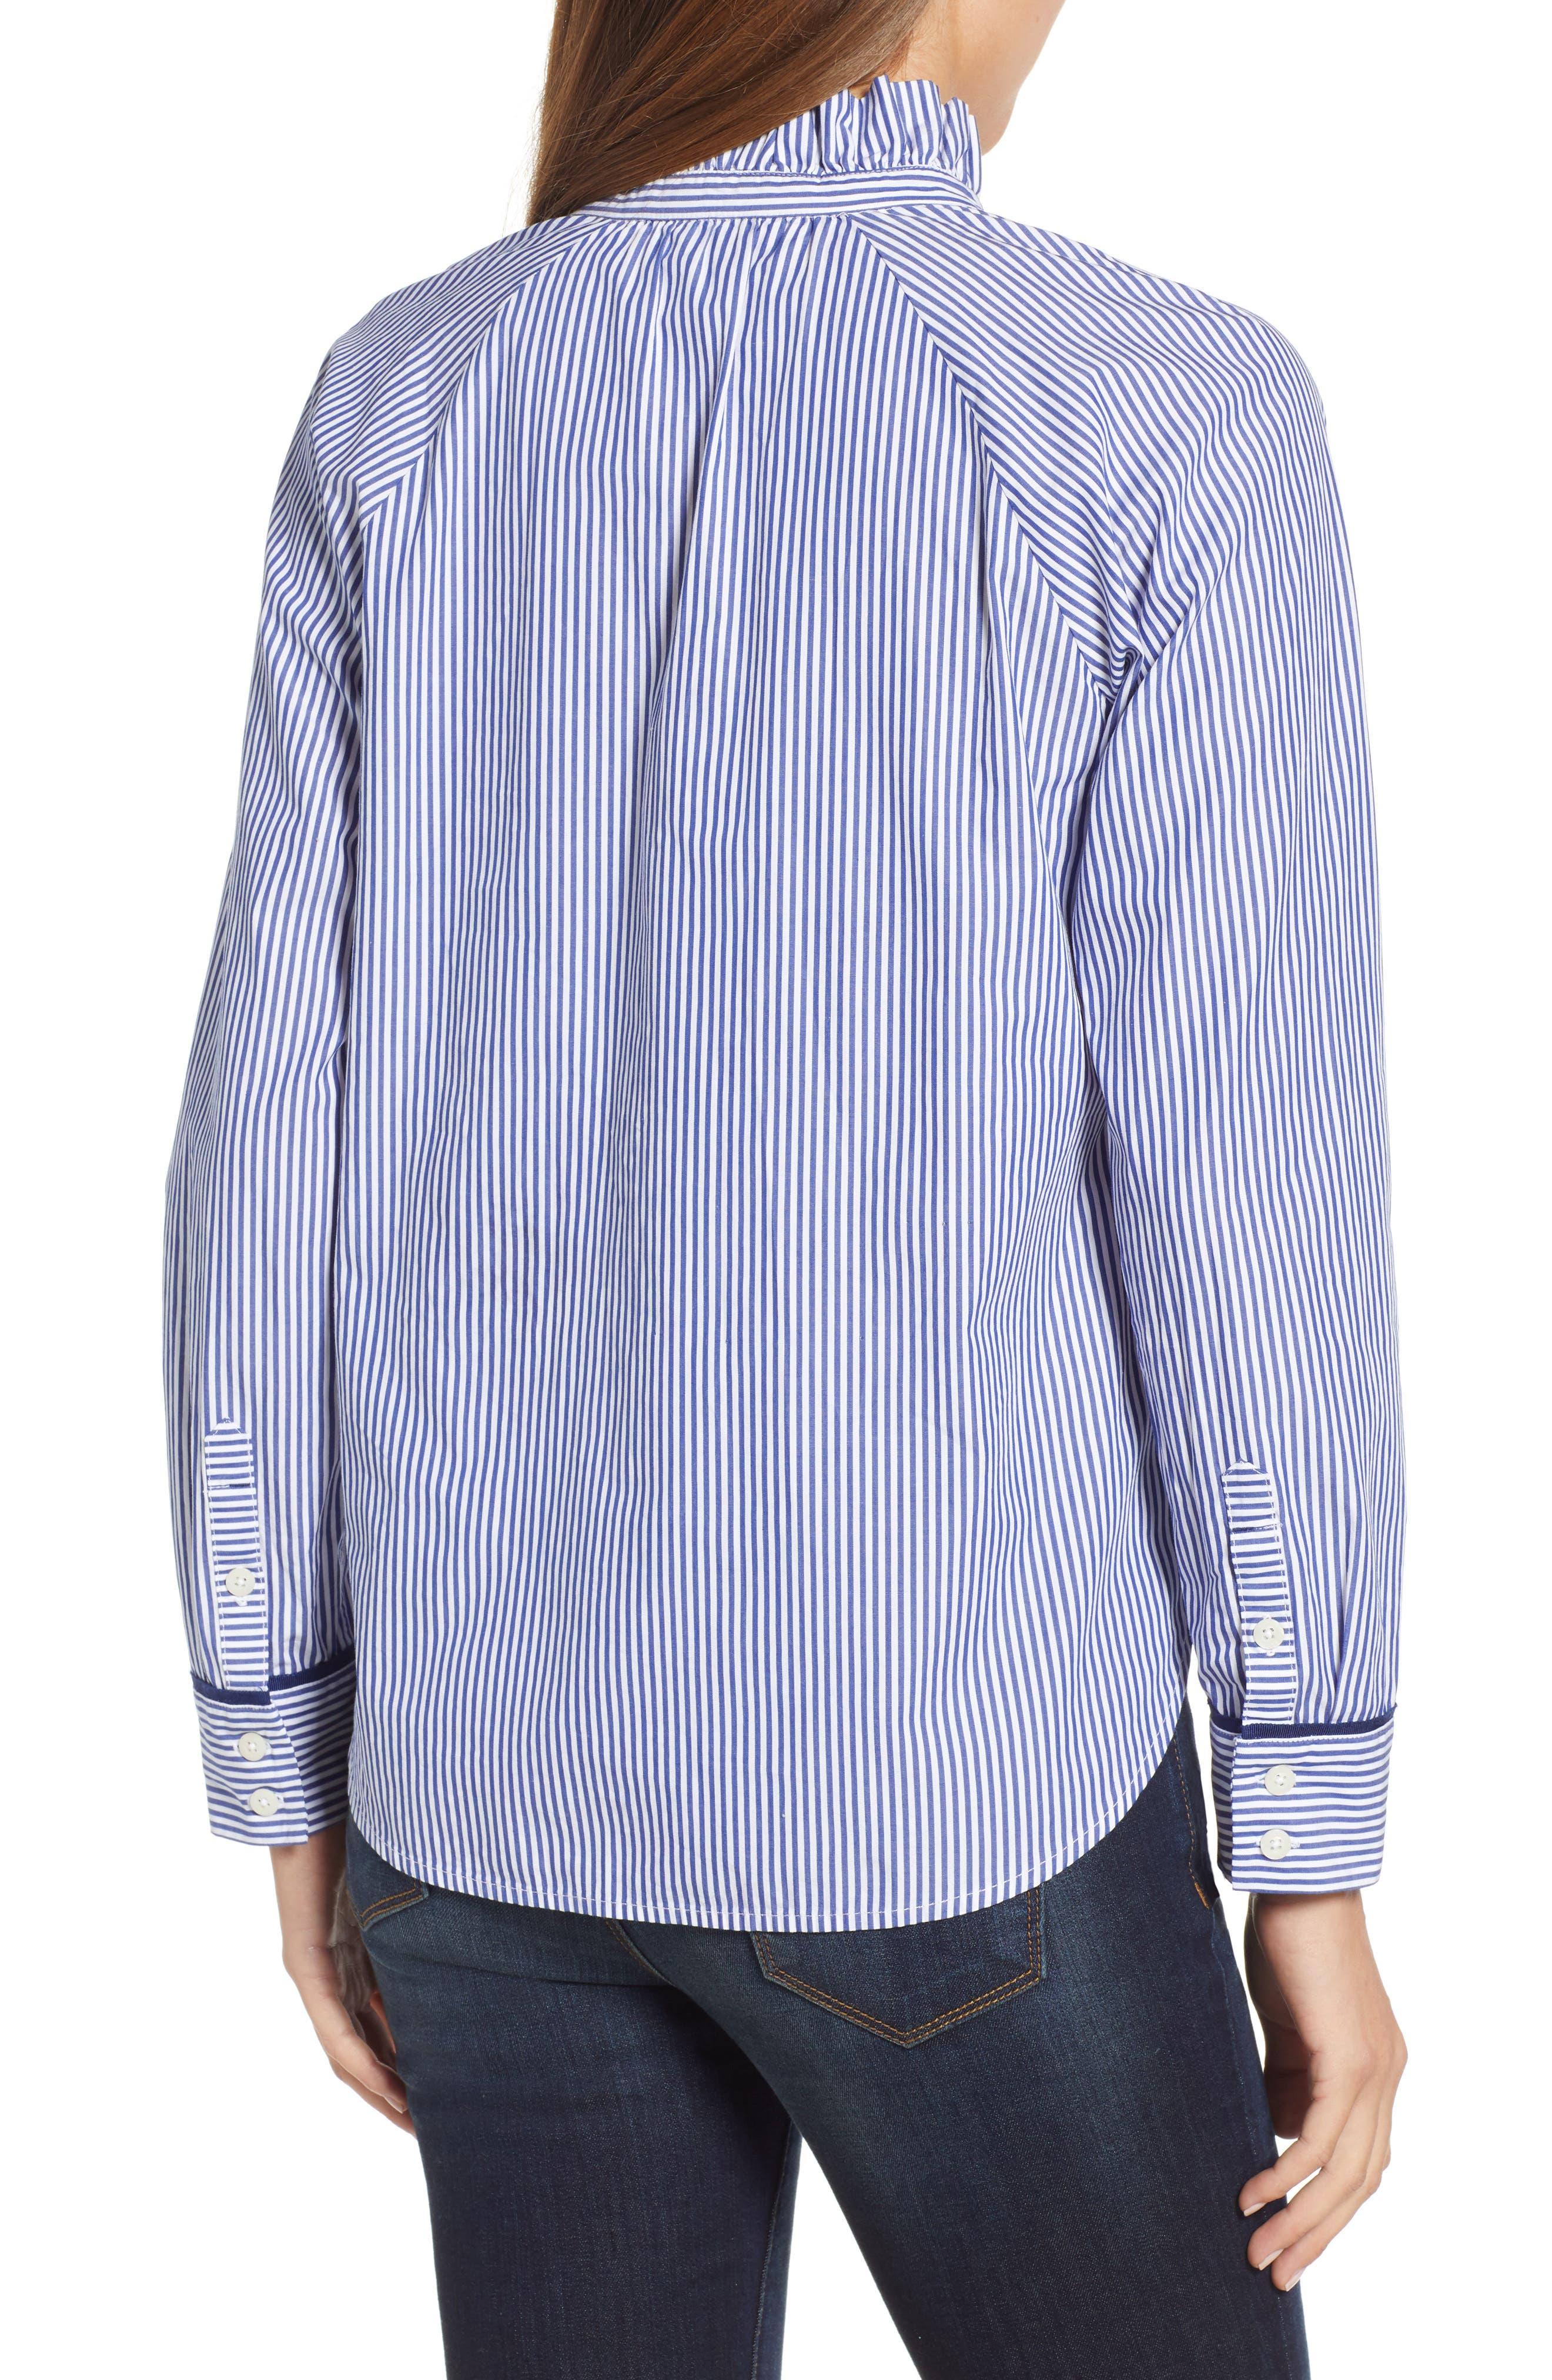 VINEYARD VINES,                             Stripe Ruffle Shirt,                             Alternate thumbnail 2, color,                             474